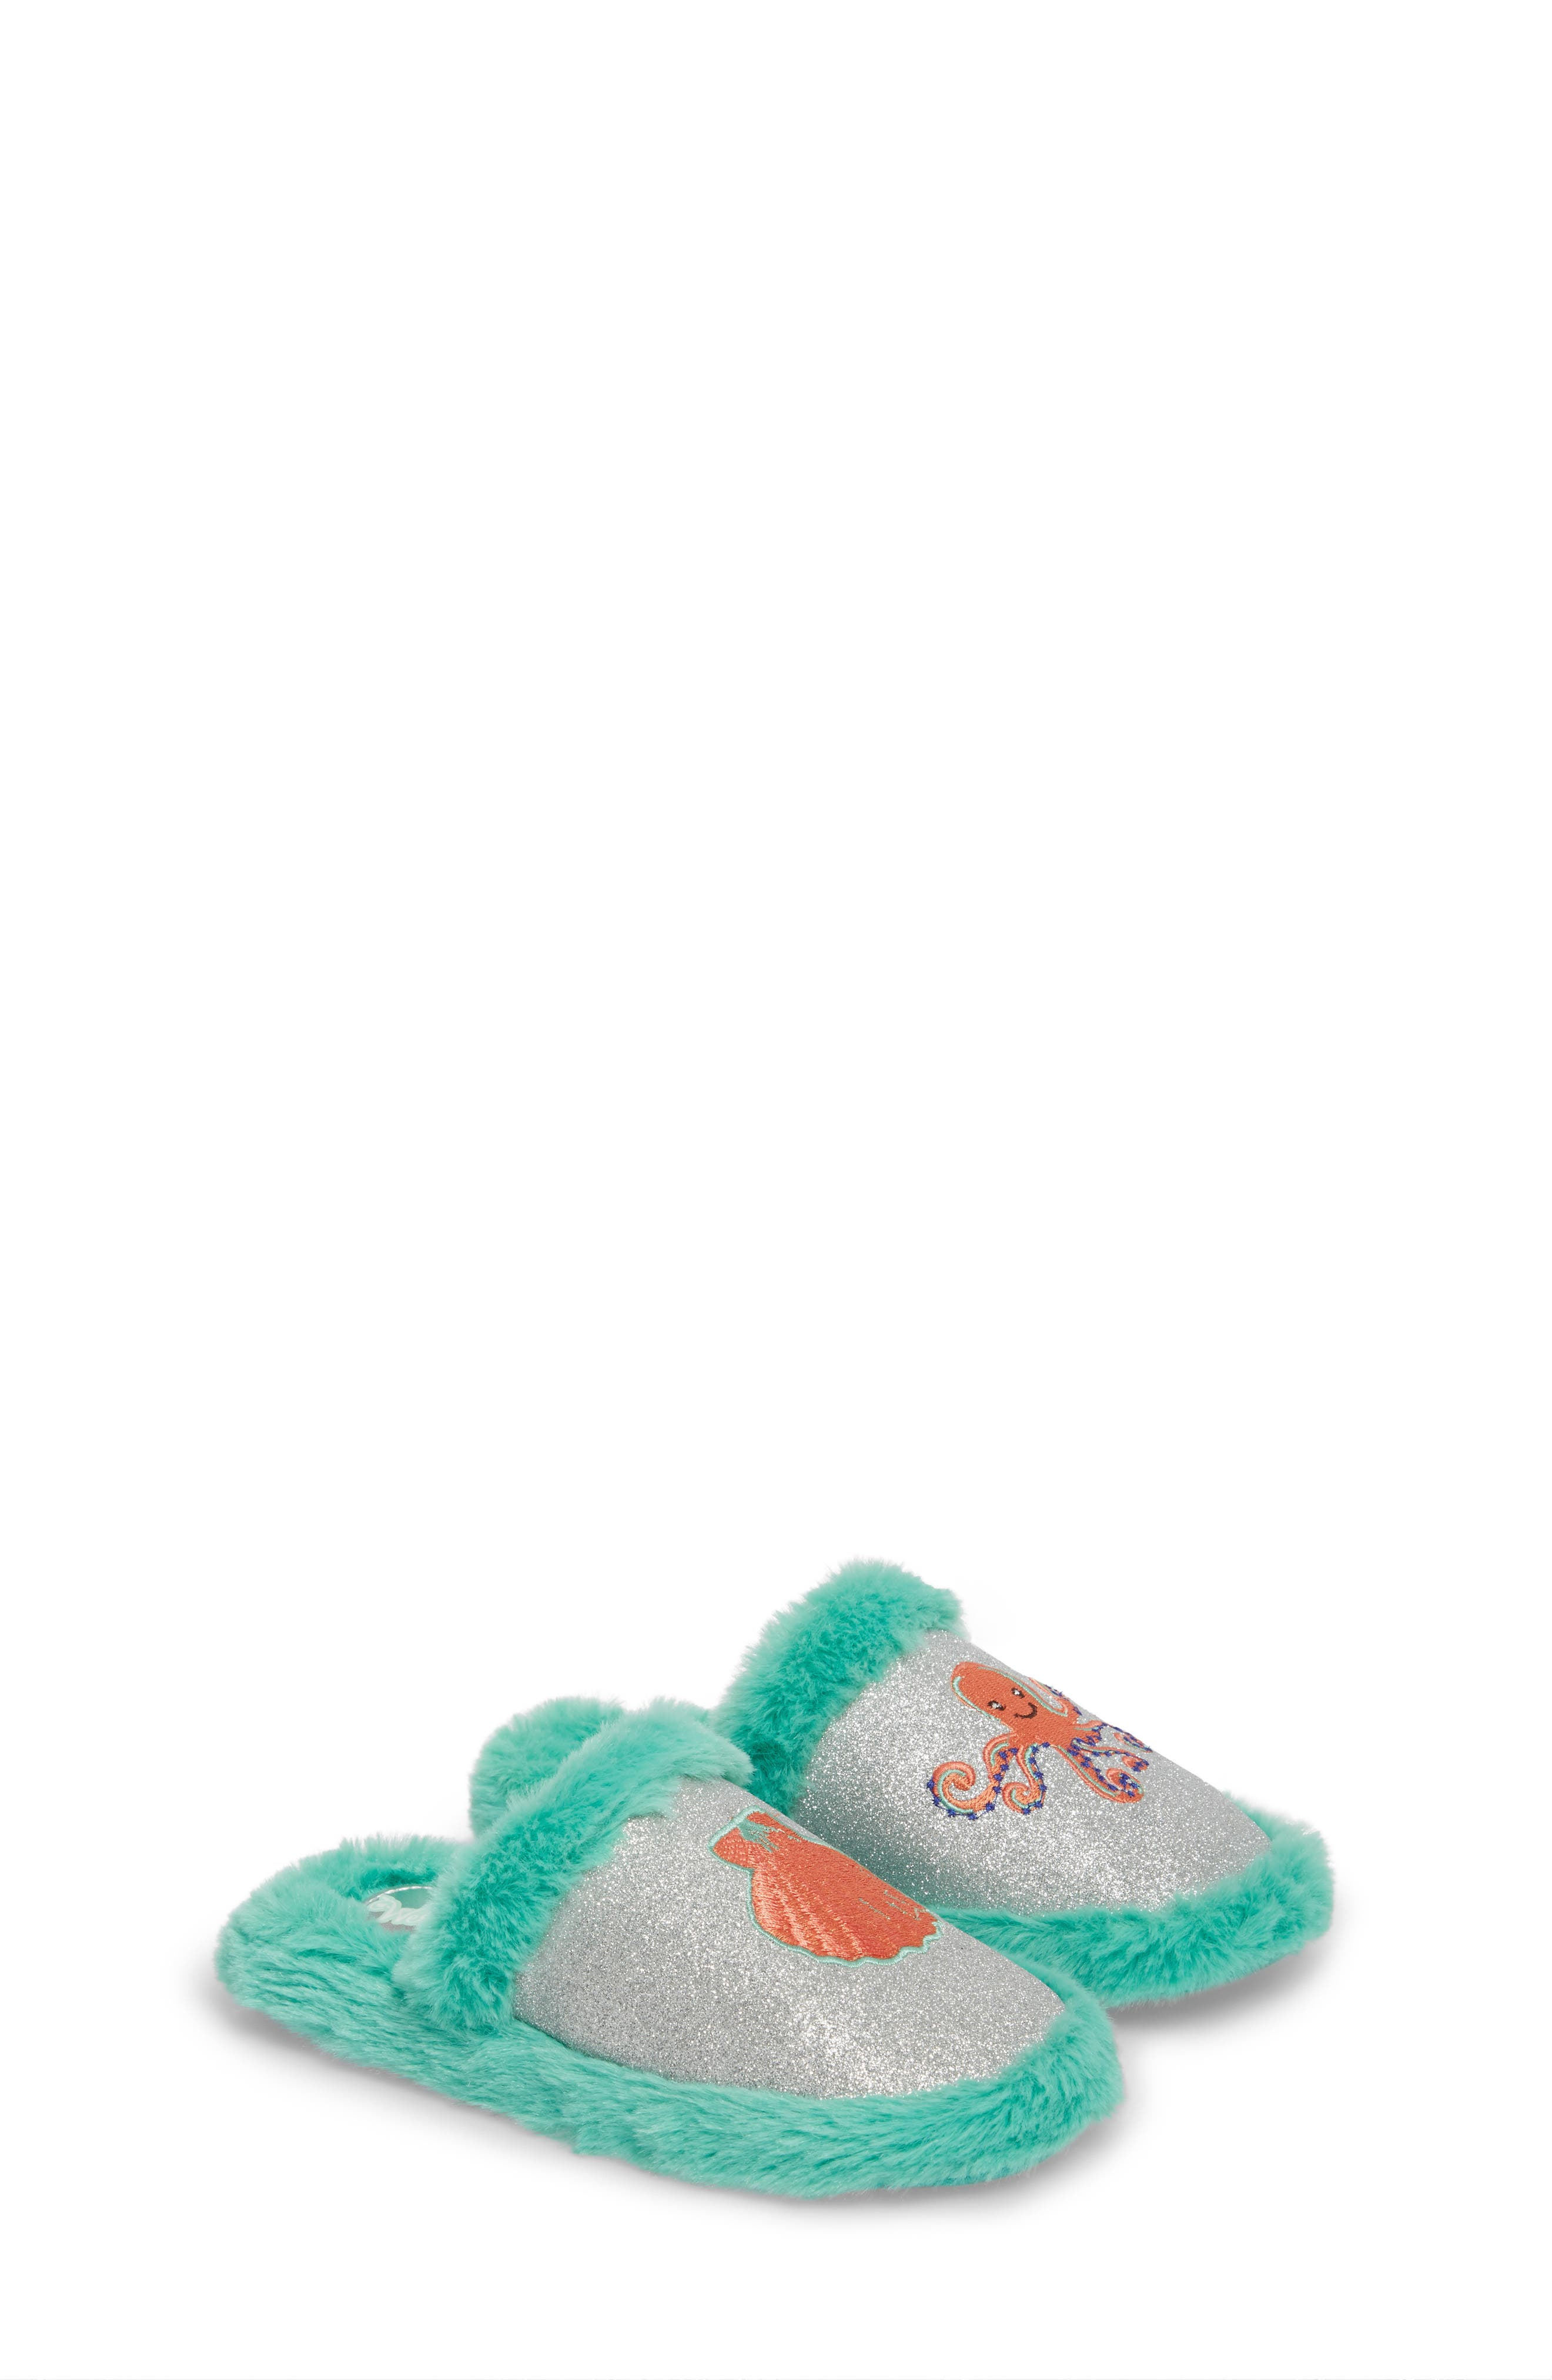 Camille Faux Fur Glitter Slipper,                             Main thumbnail 1, color,                             040